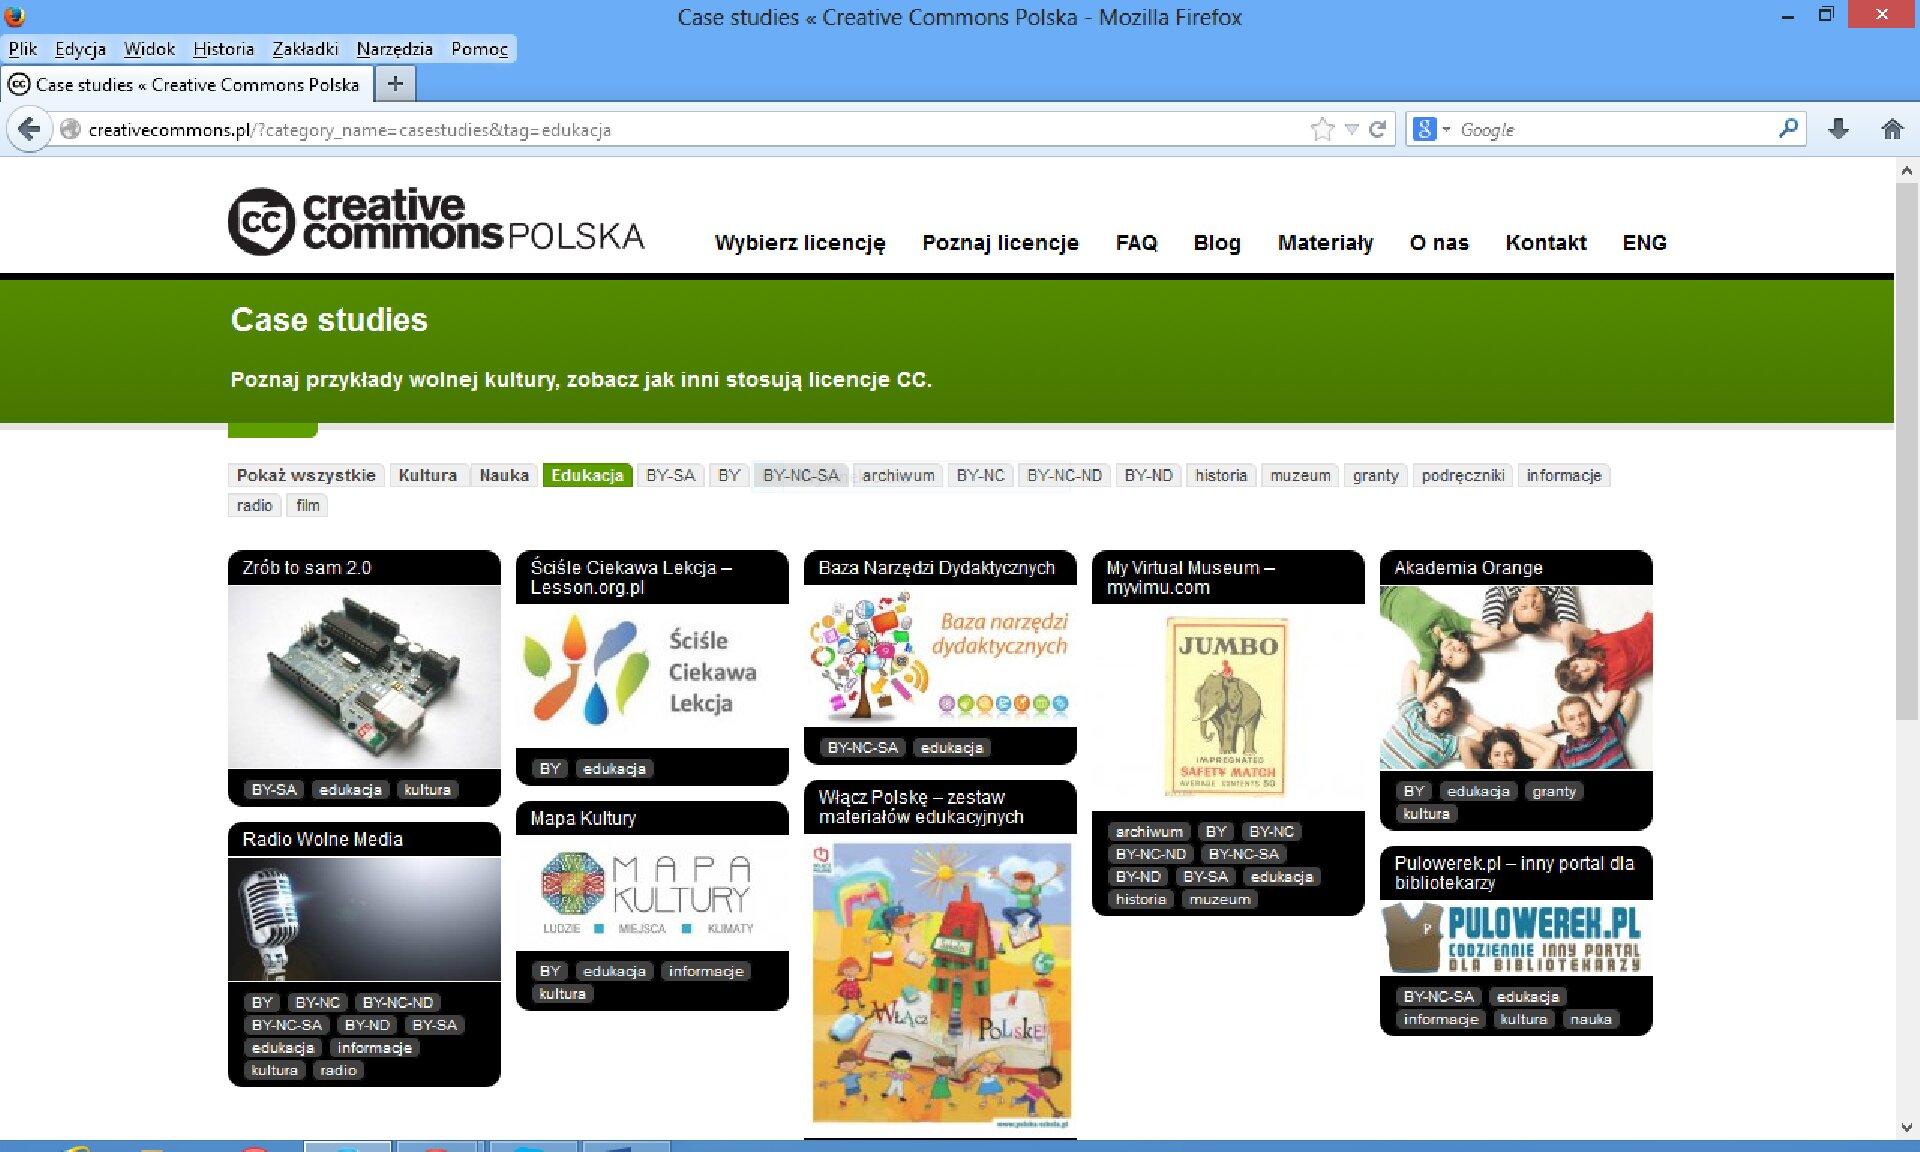 Zrzut okna strony internetowej http://creativecommons.pl